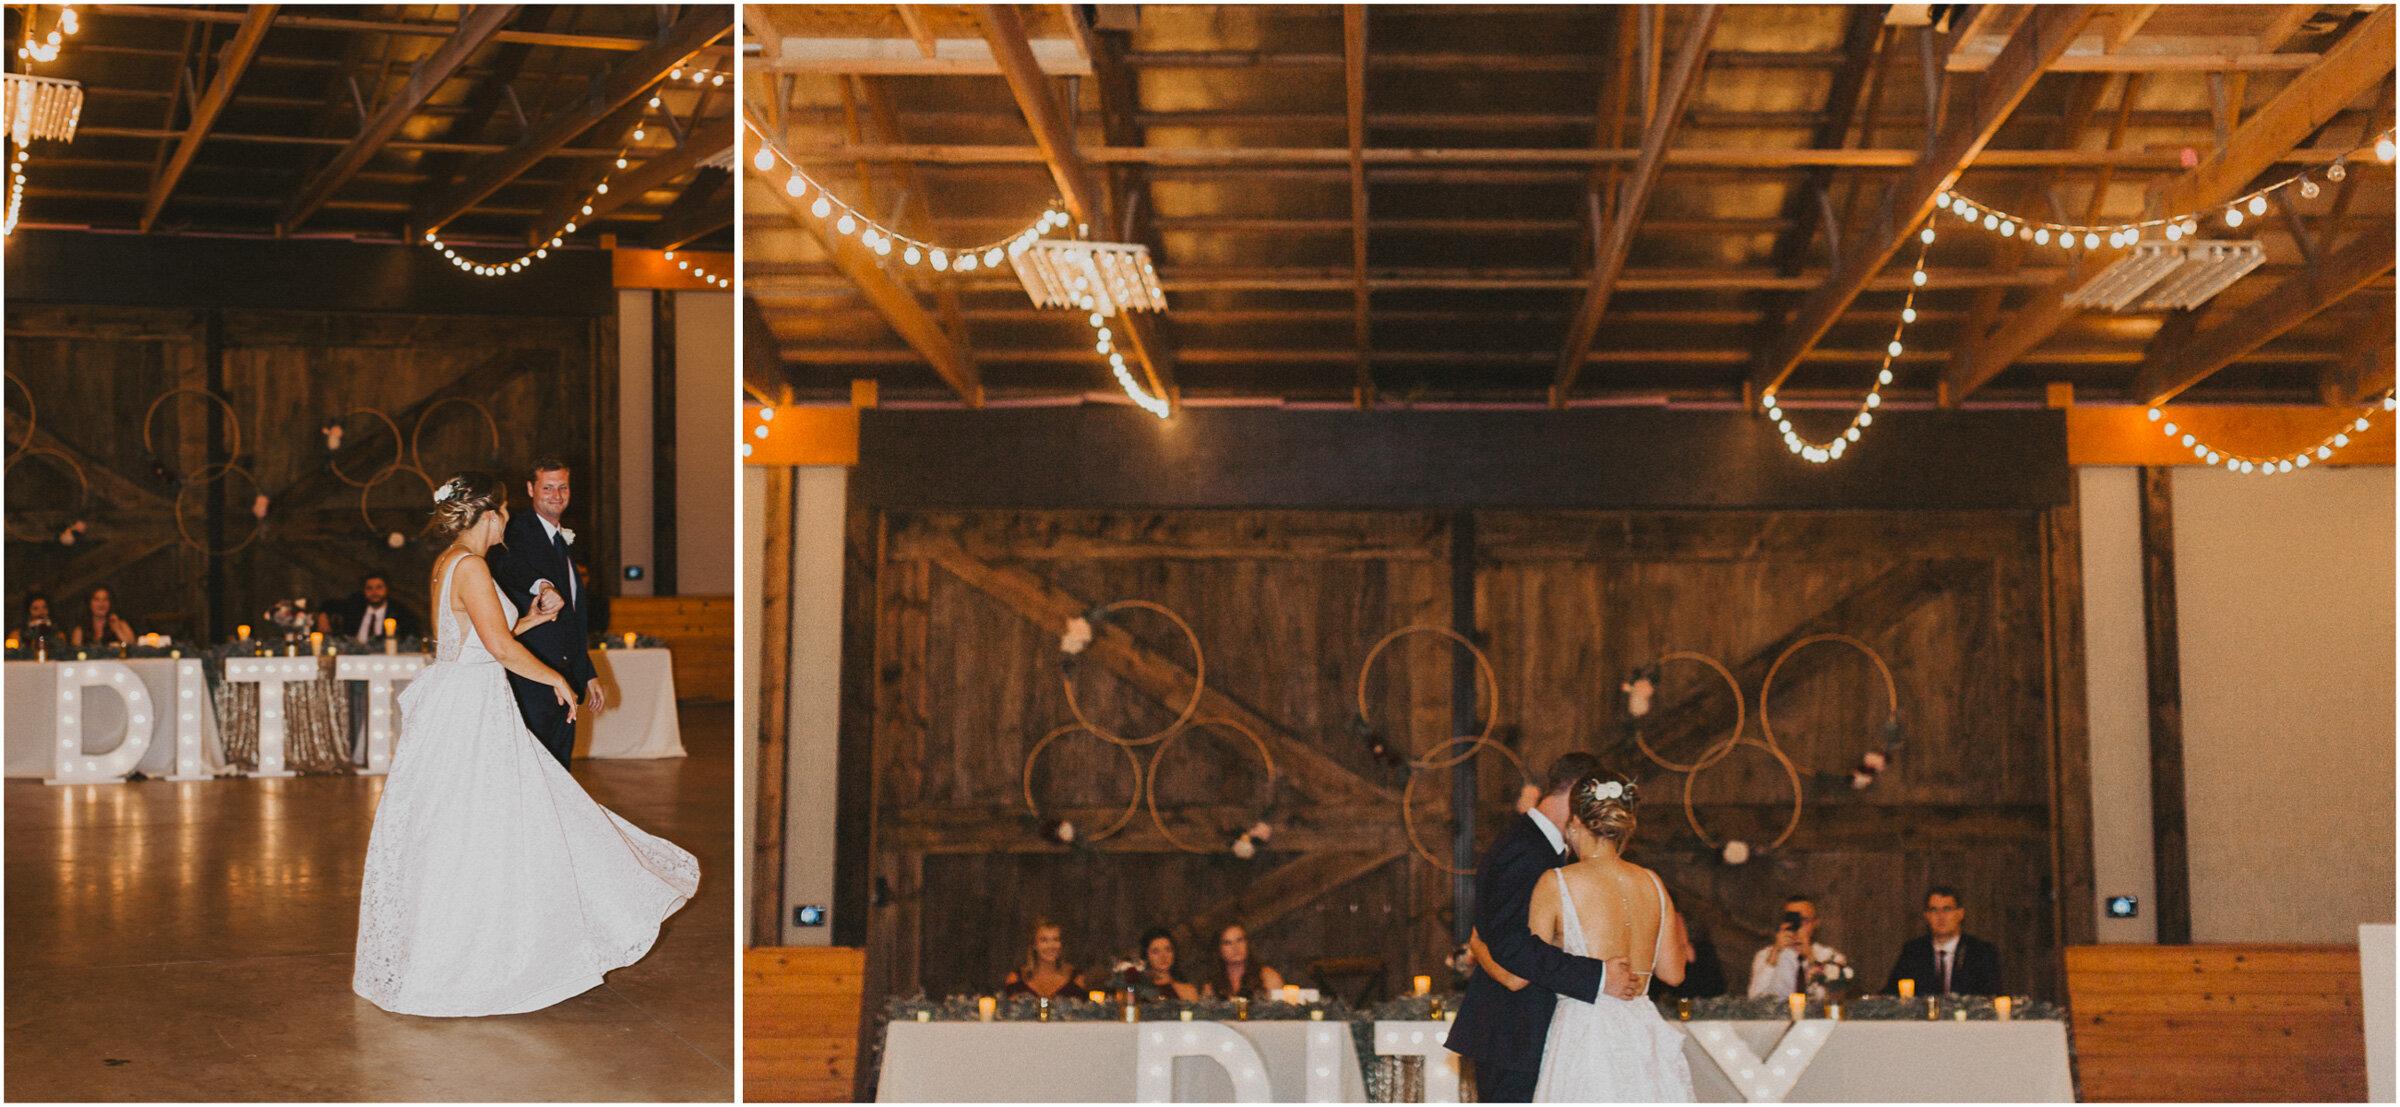 alyssa barletter photography summer wedding photographer powell gardens-39.jpg